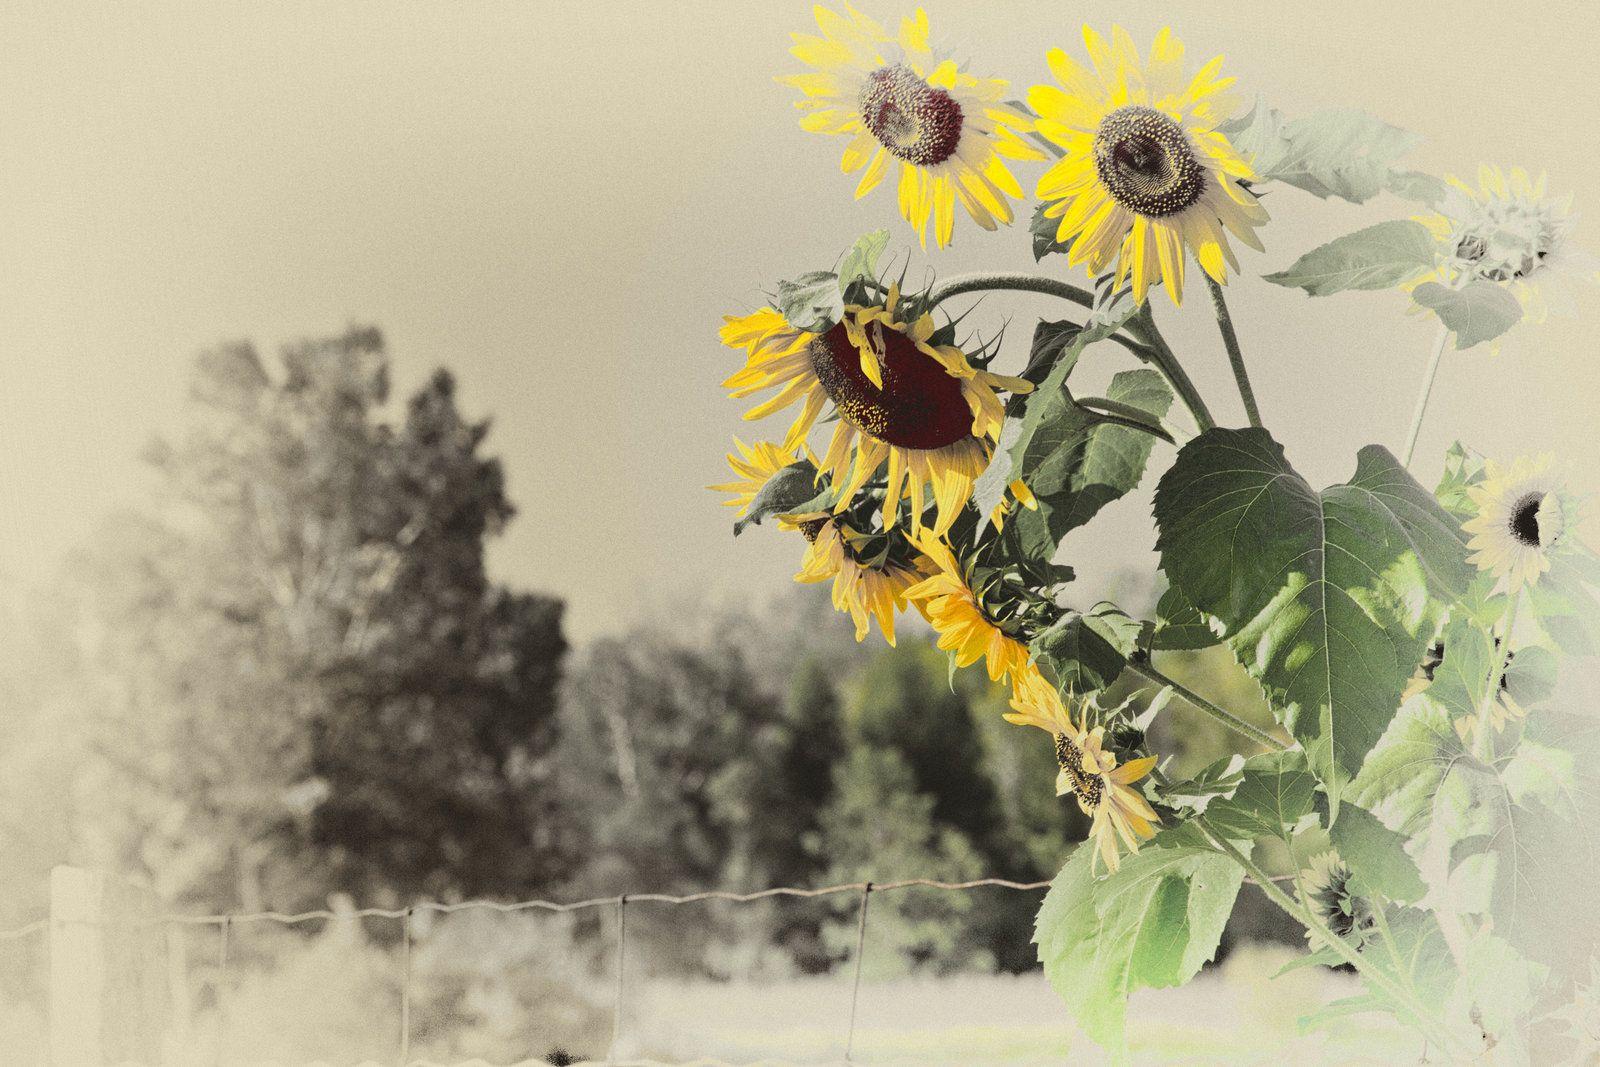 Tumblr Sunflowers Vintage Wallpaper